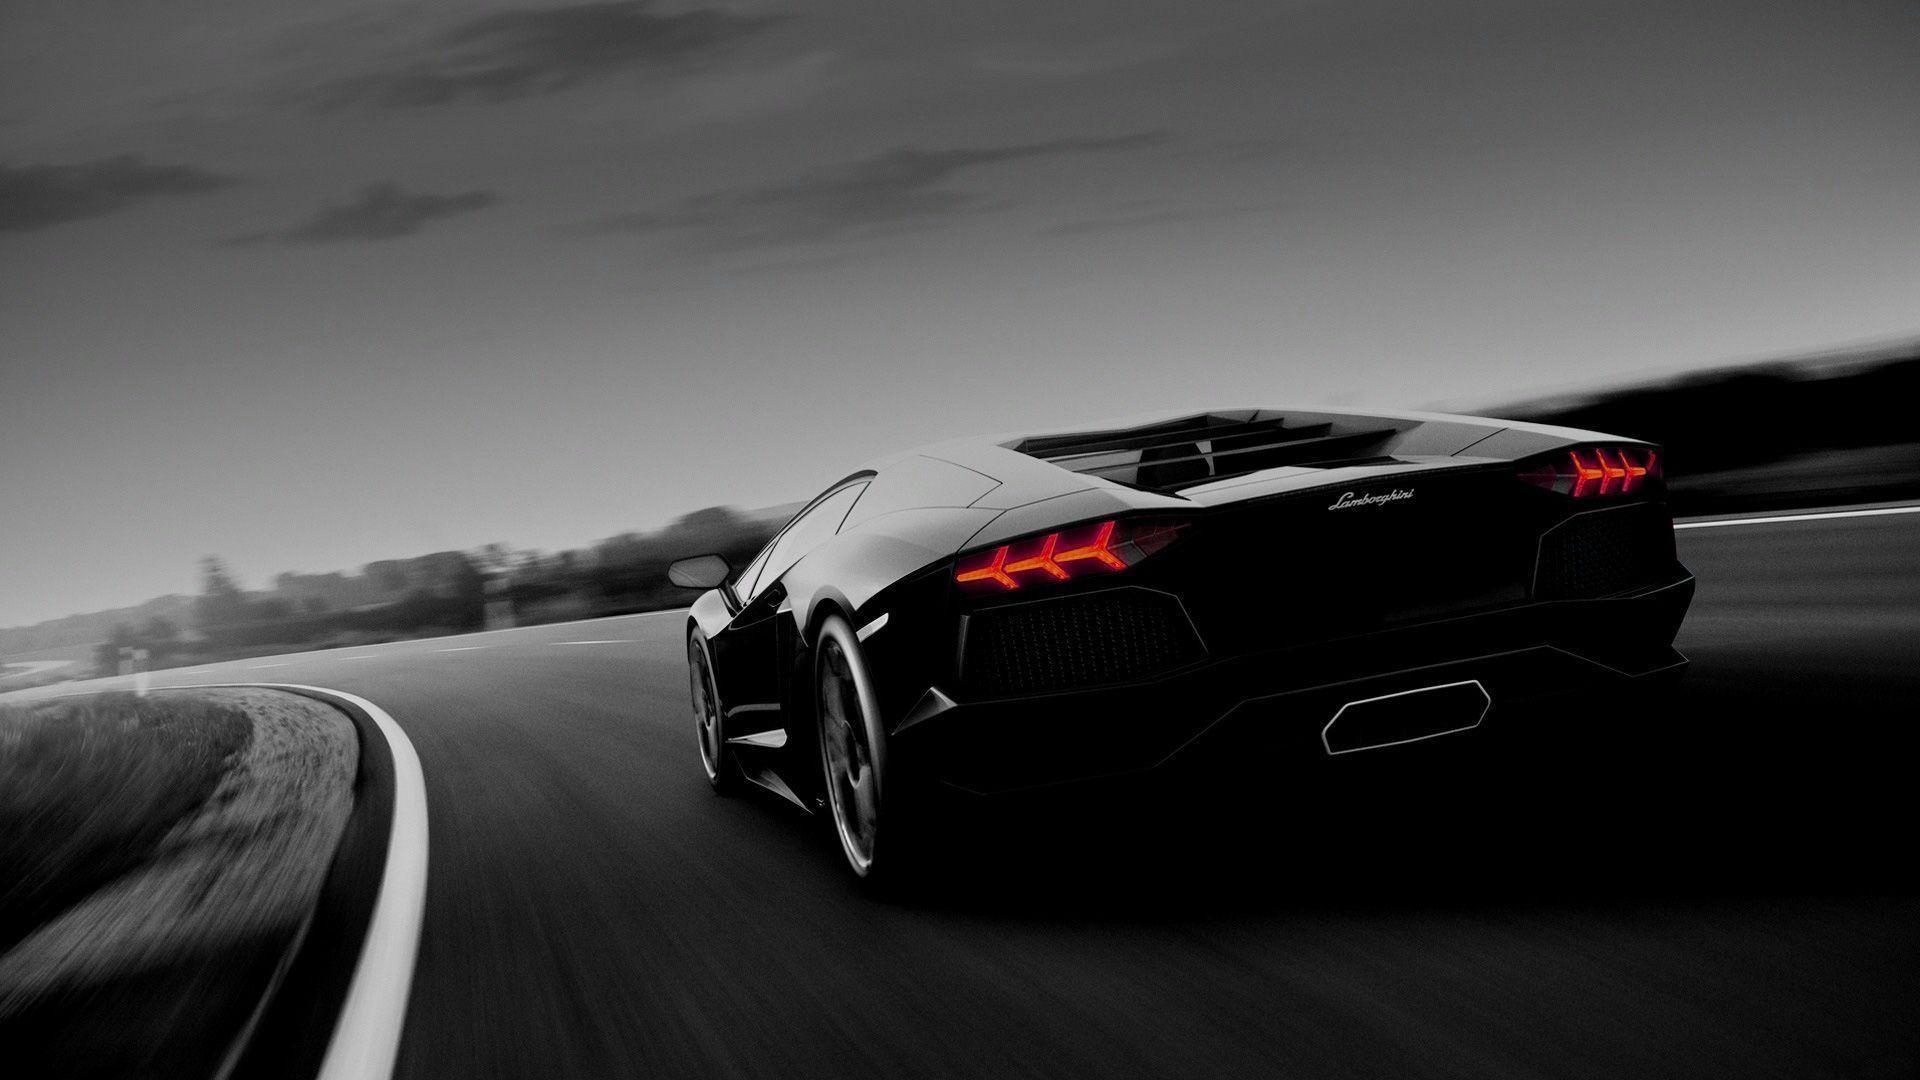 Lamborghini Aventador Wallpaper Hd 89 Images